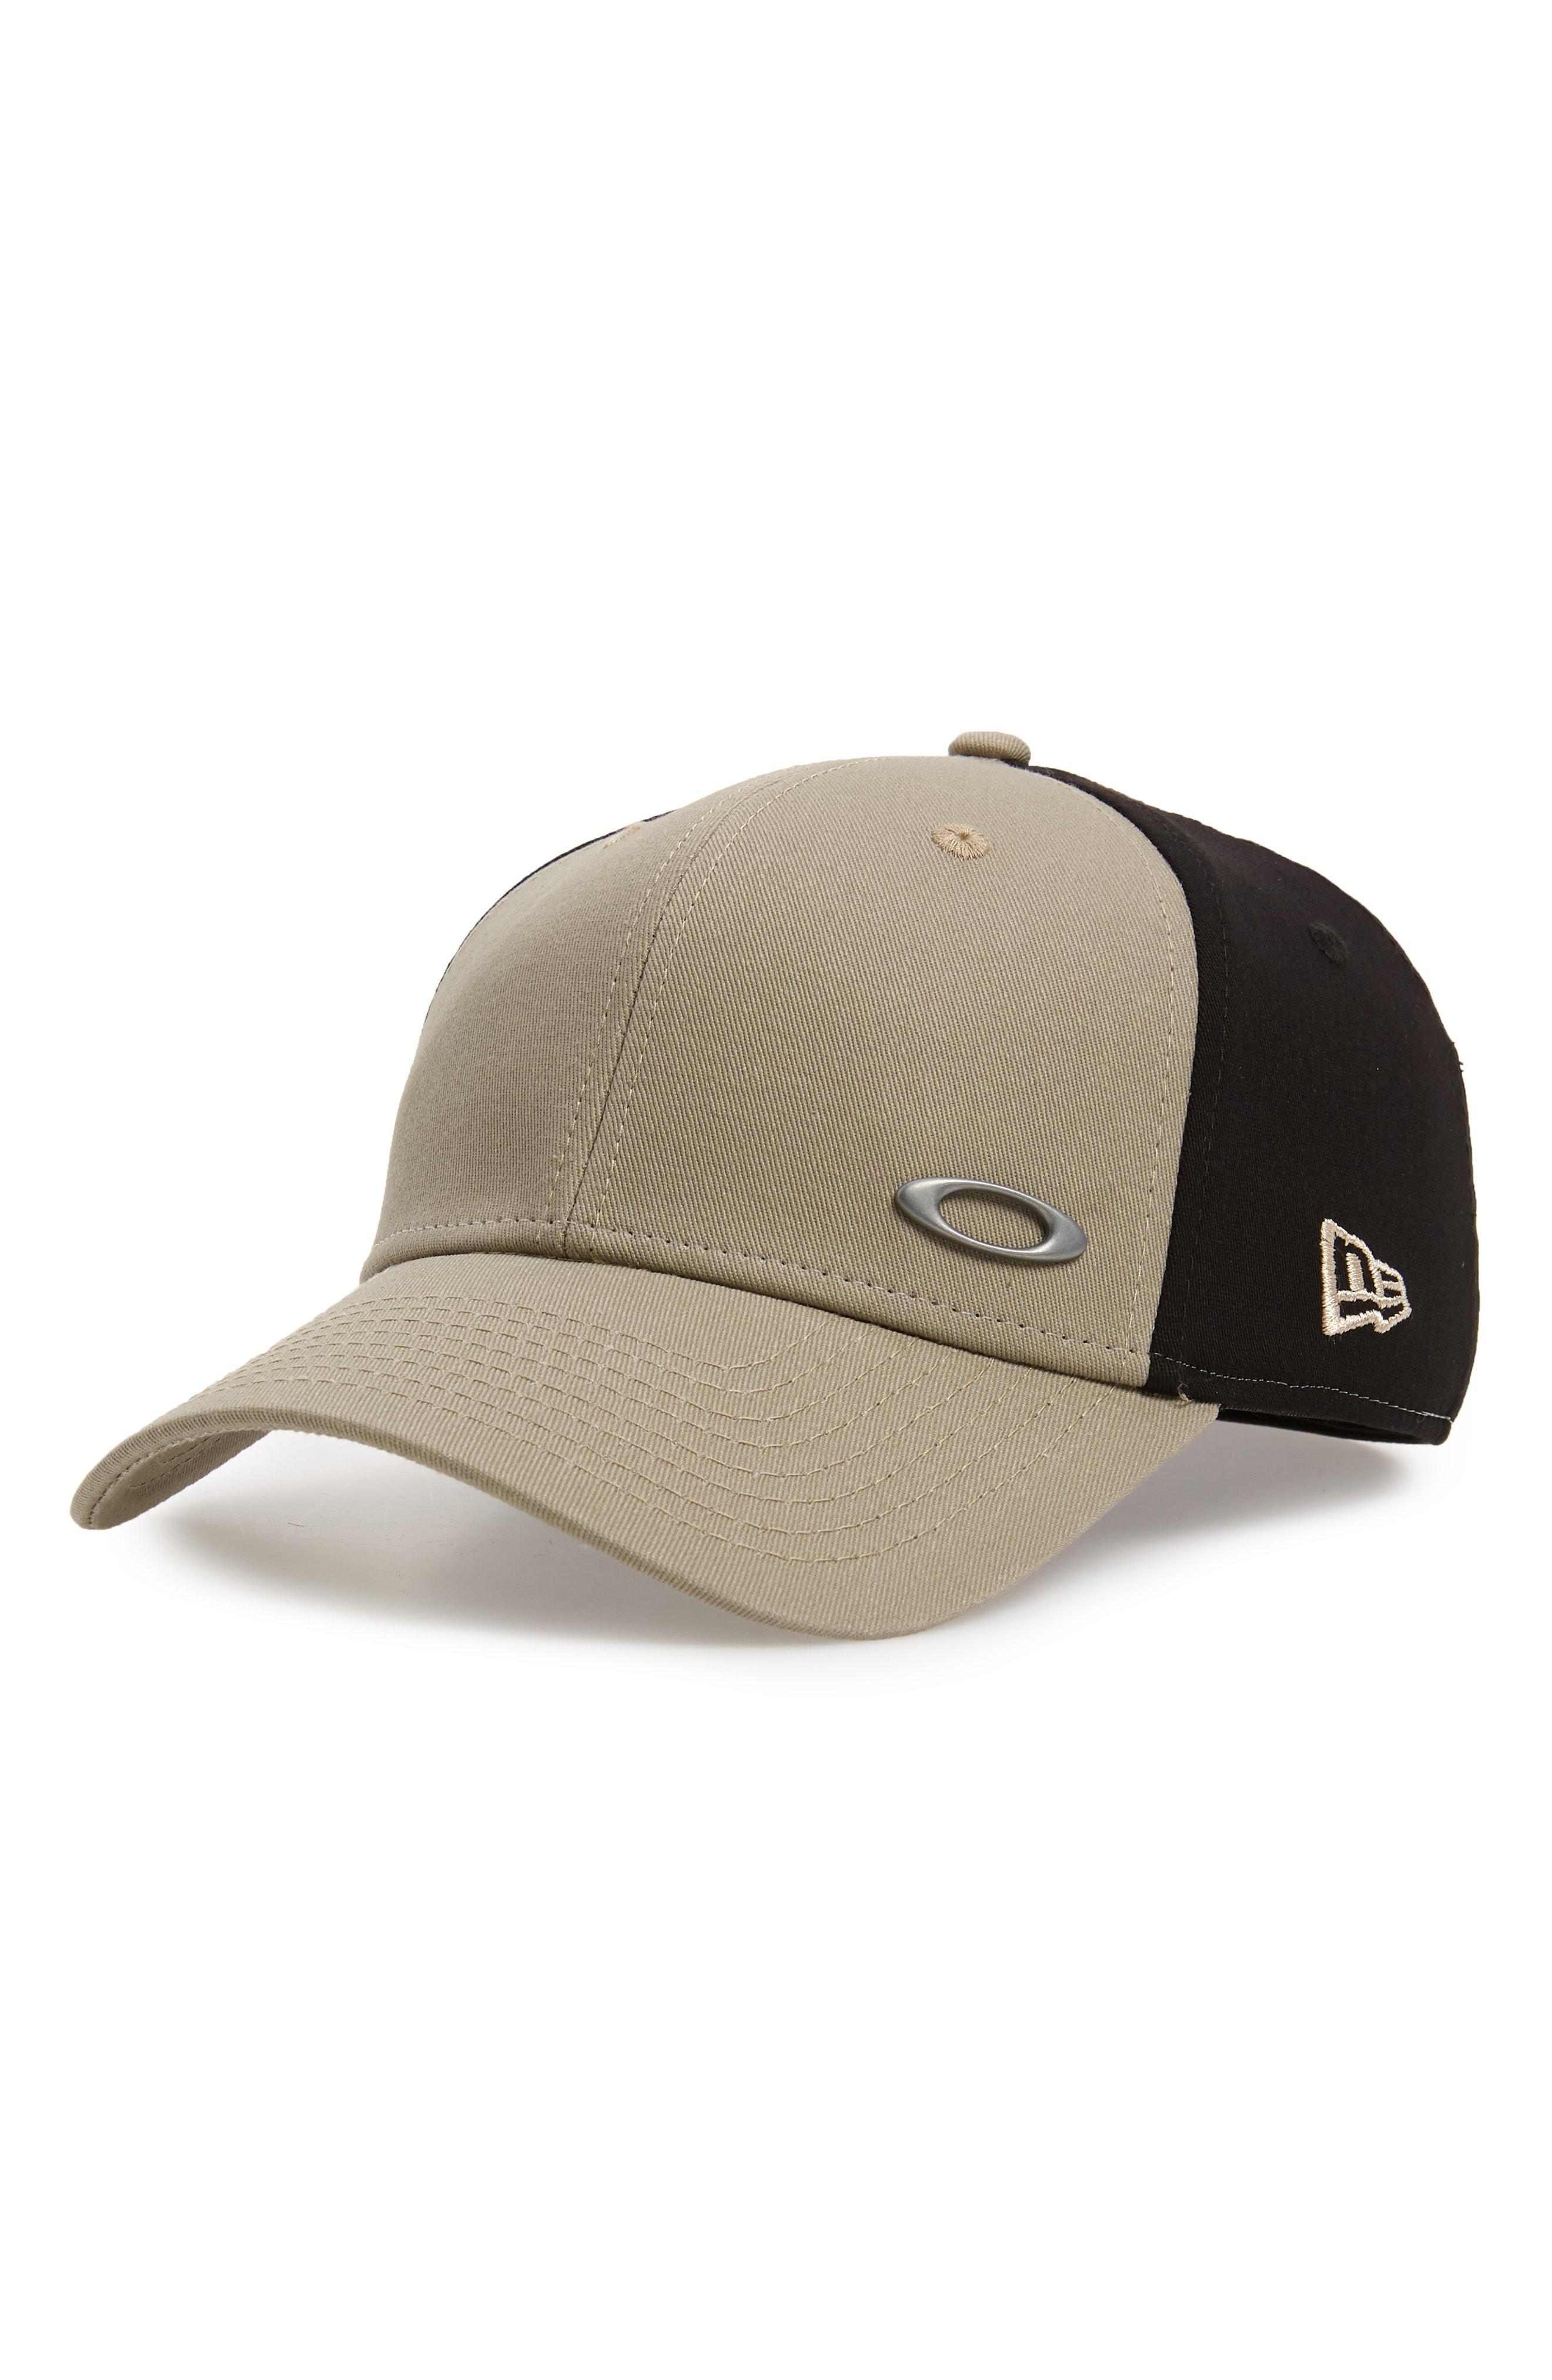 Lyst - Oakley Tinfoil Baseball Cap - for Men 27a476585a26